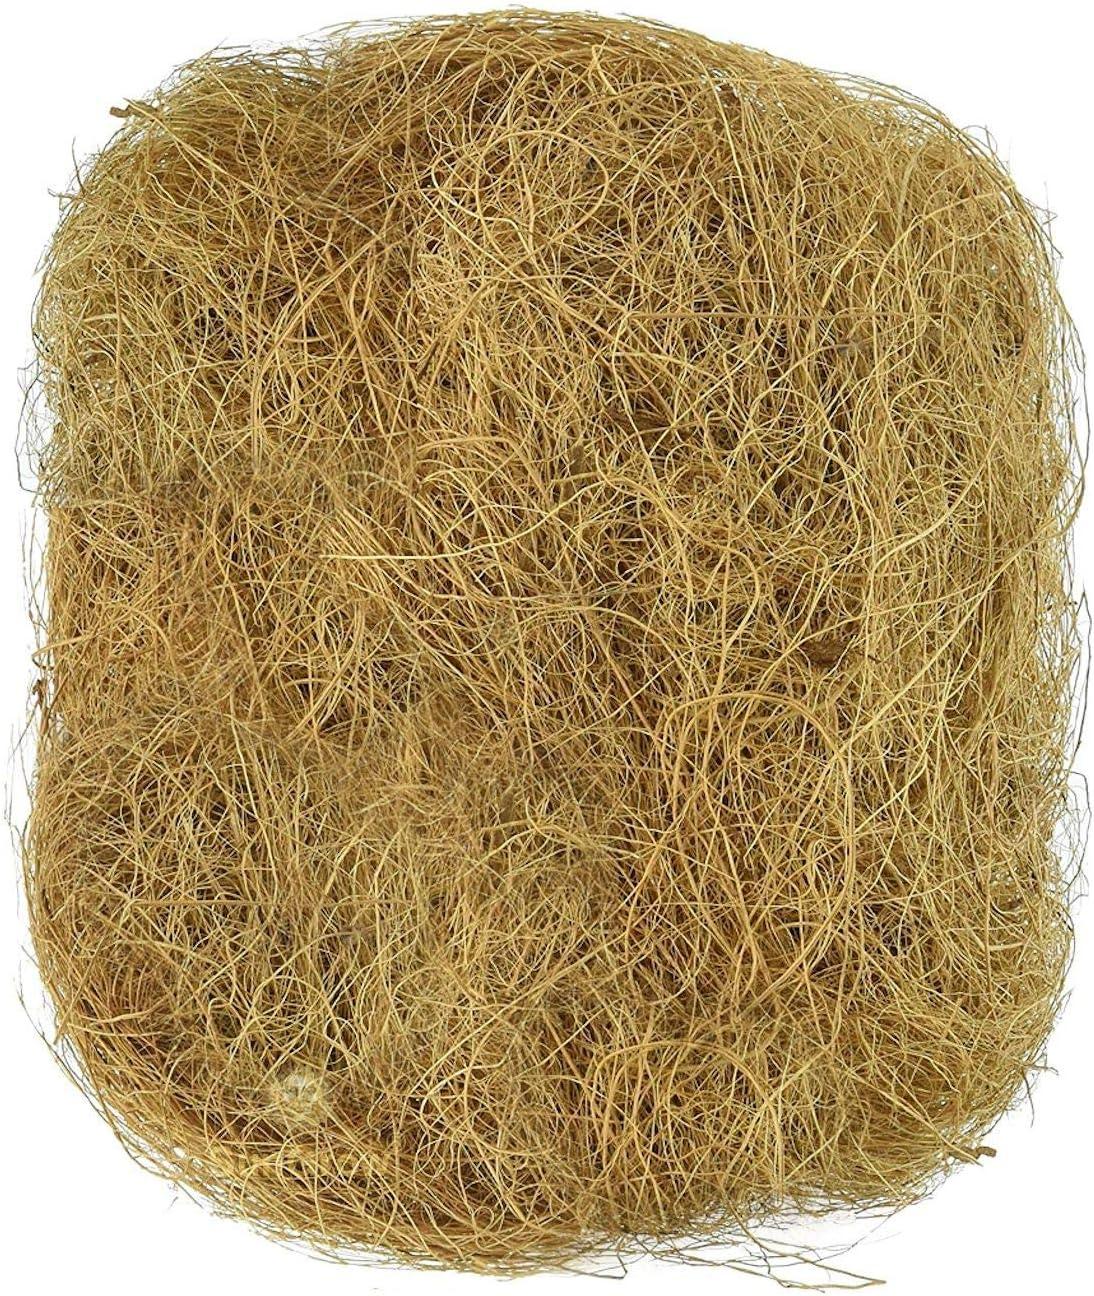 shop SunGrow 5 oz. Coconut Fiber Comfortable Small Brand new for Bedding Birds